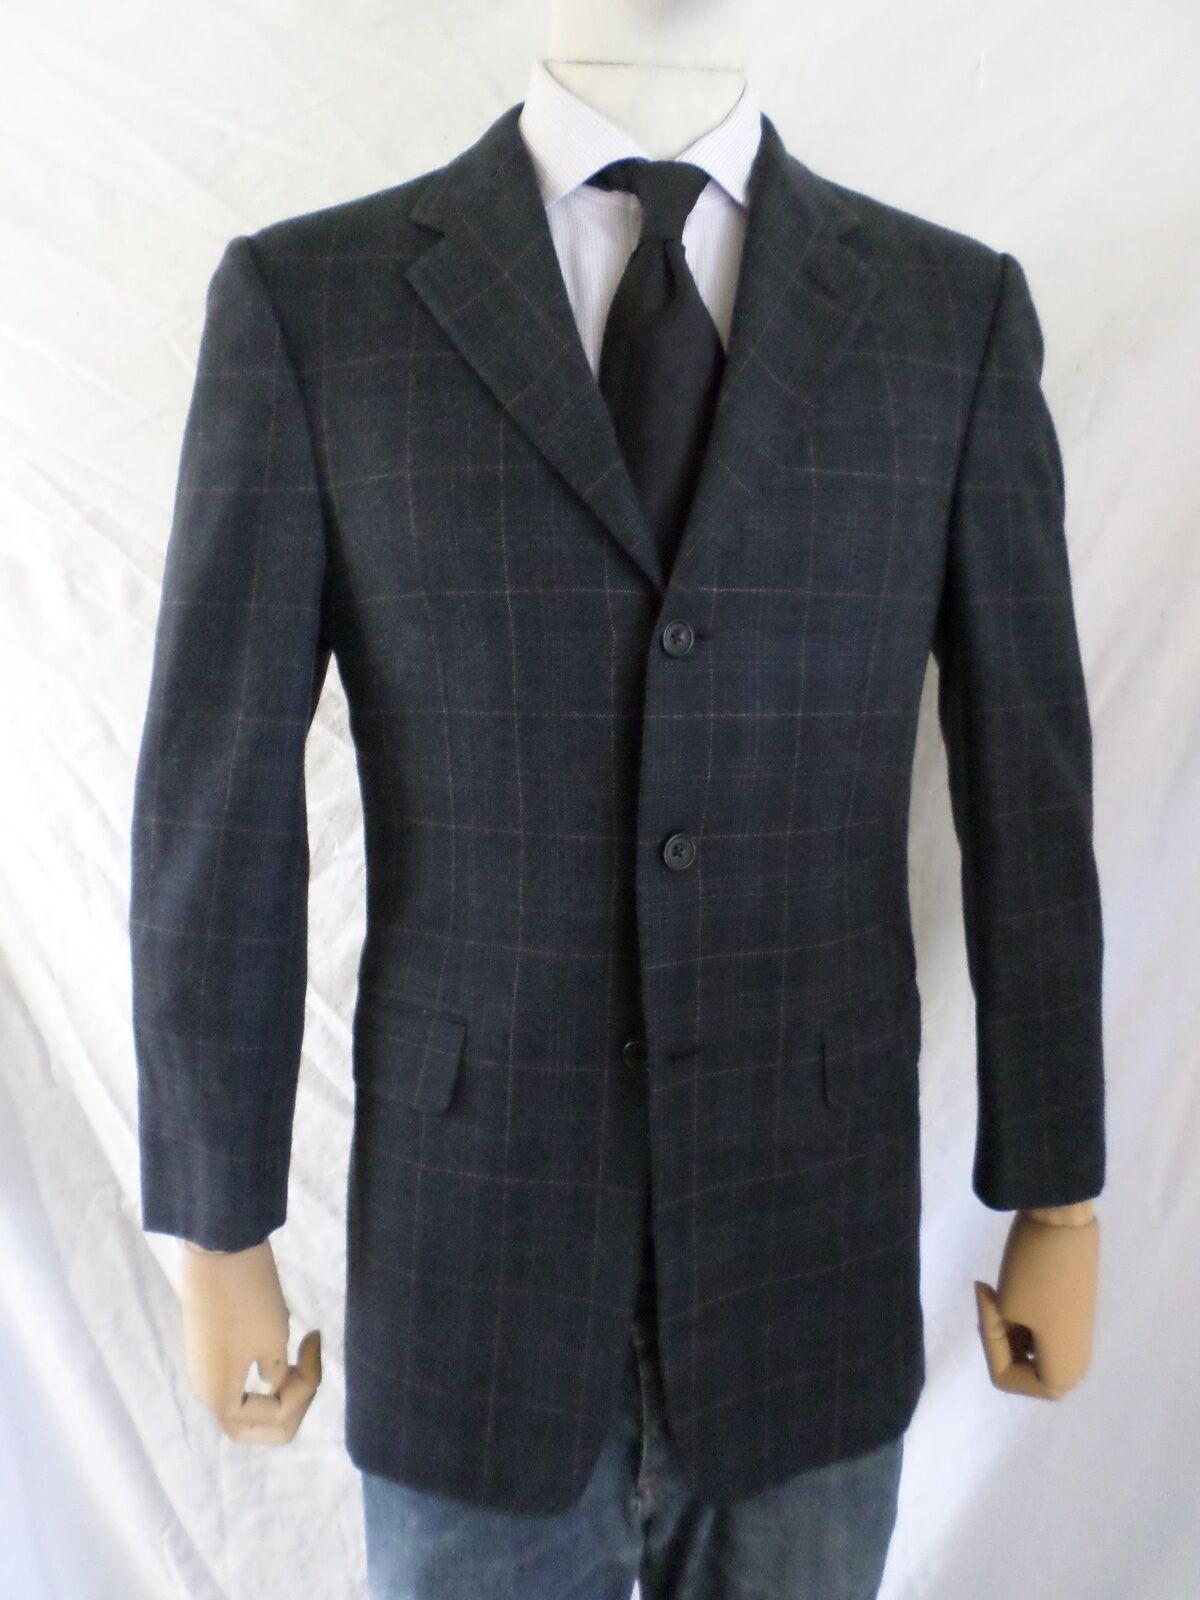 Hickey Freeman Madison Blau plaid wool silk blazer sport coat jacket 36R